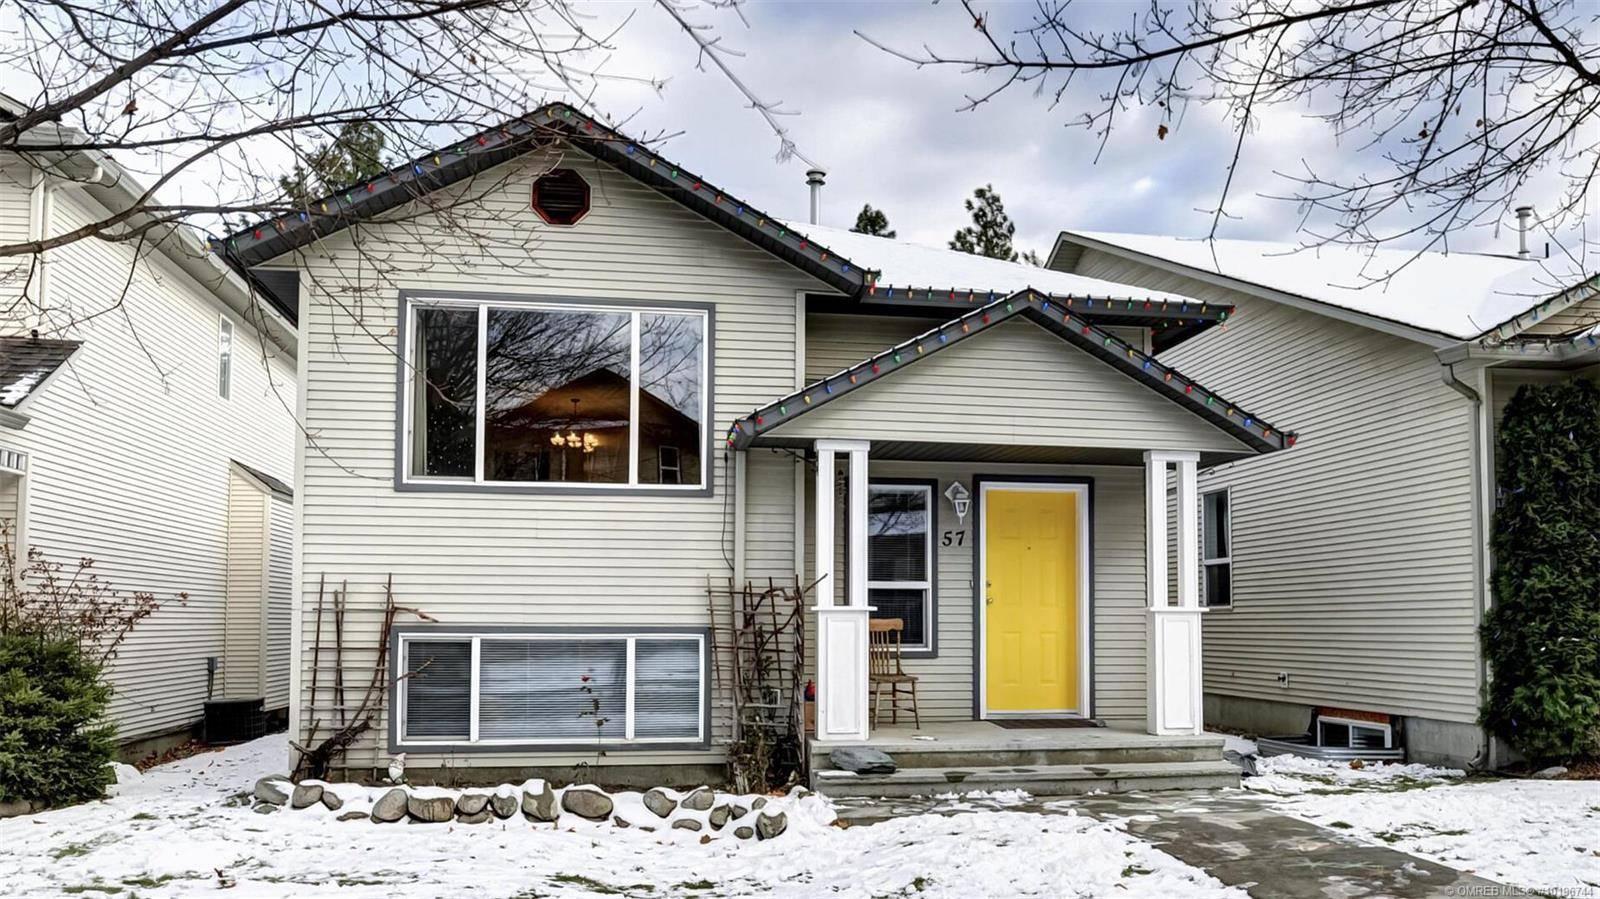 House for sale at 2210 Horizon Dr Unit 57 West Kelowna British Columbia - MLS: 10196744